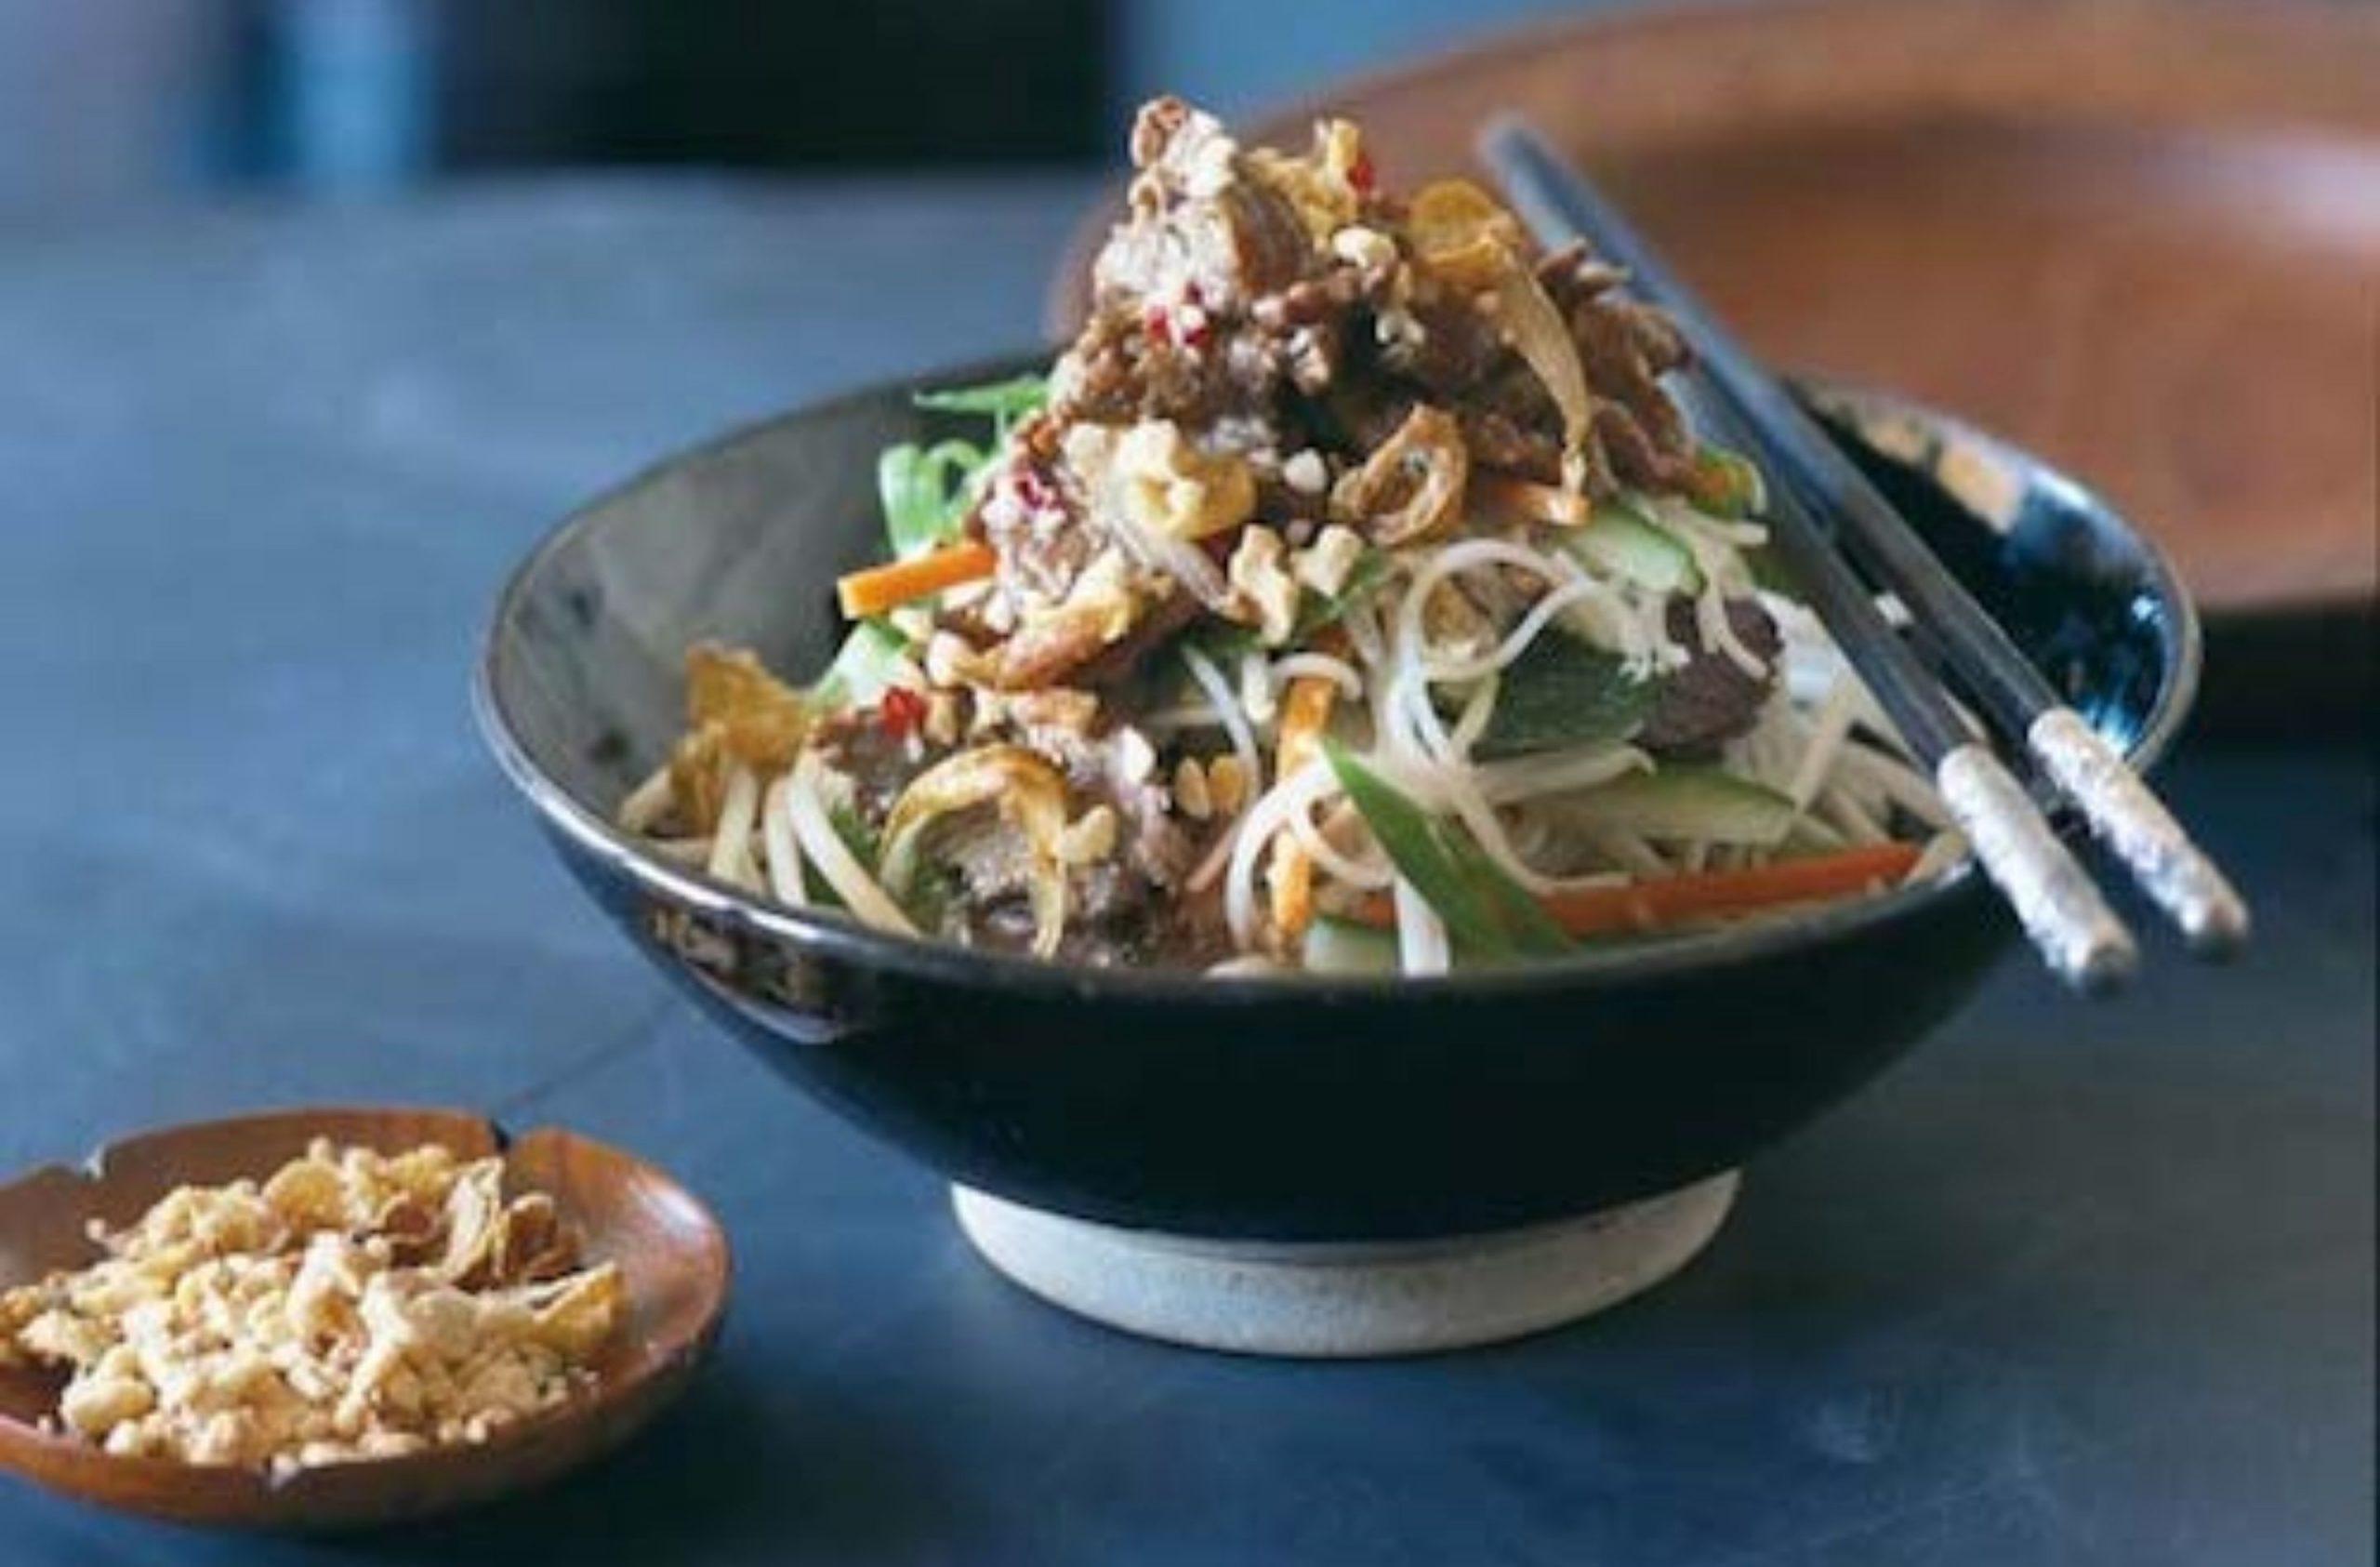 Lamb or beef noodles and peanut salad